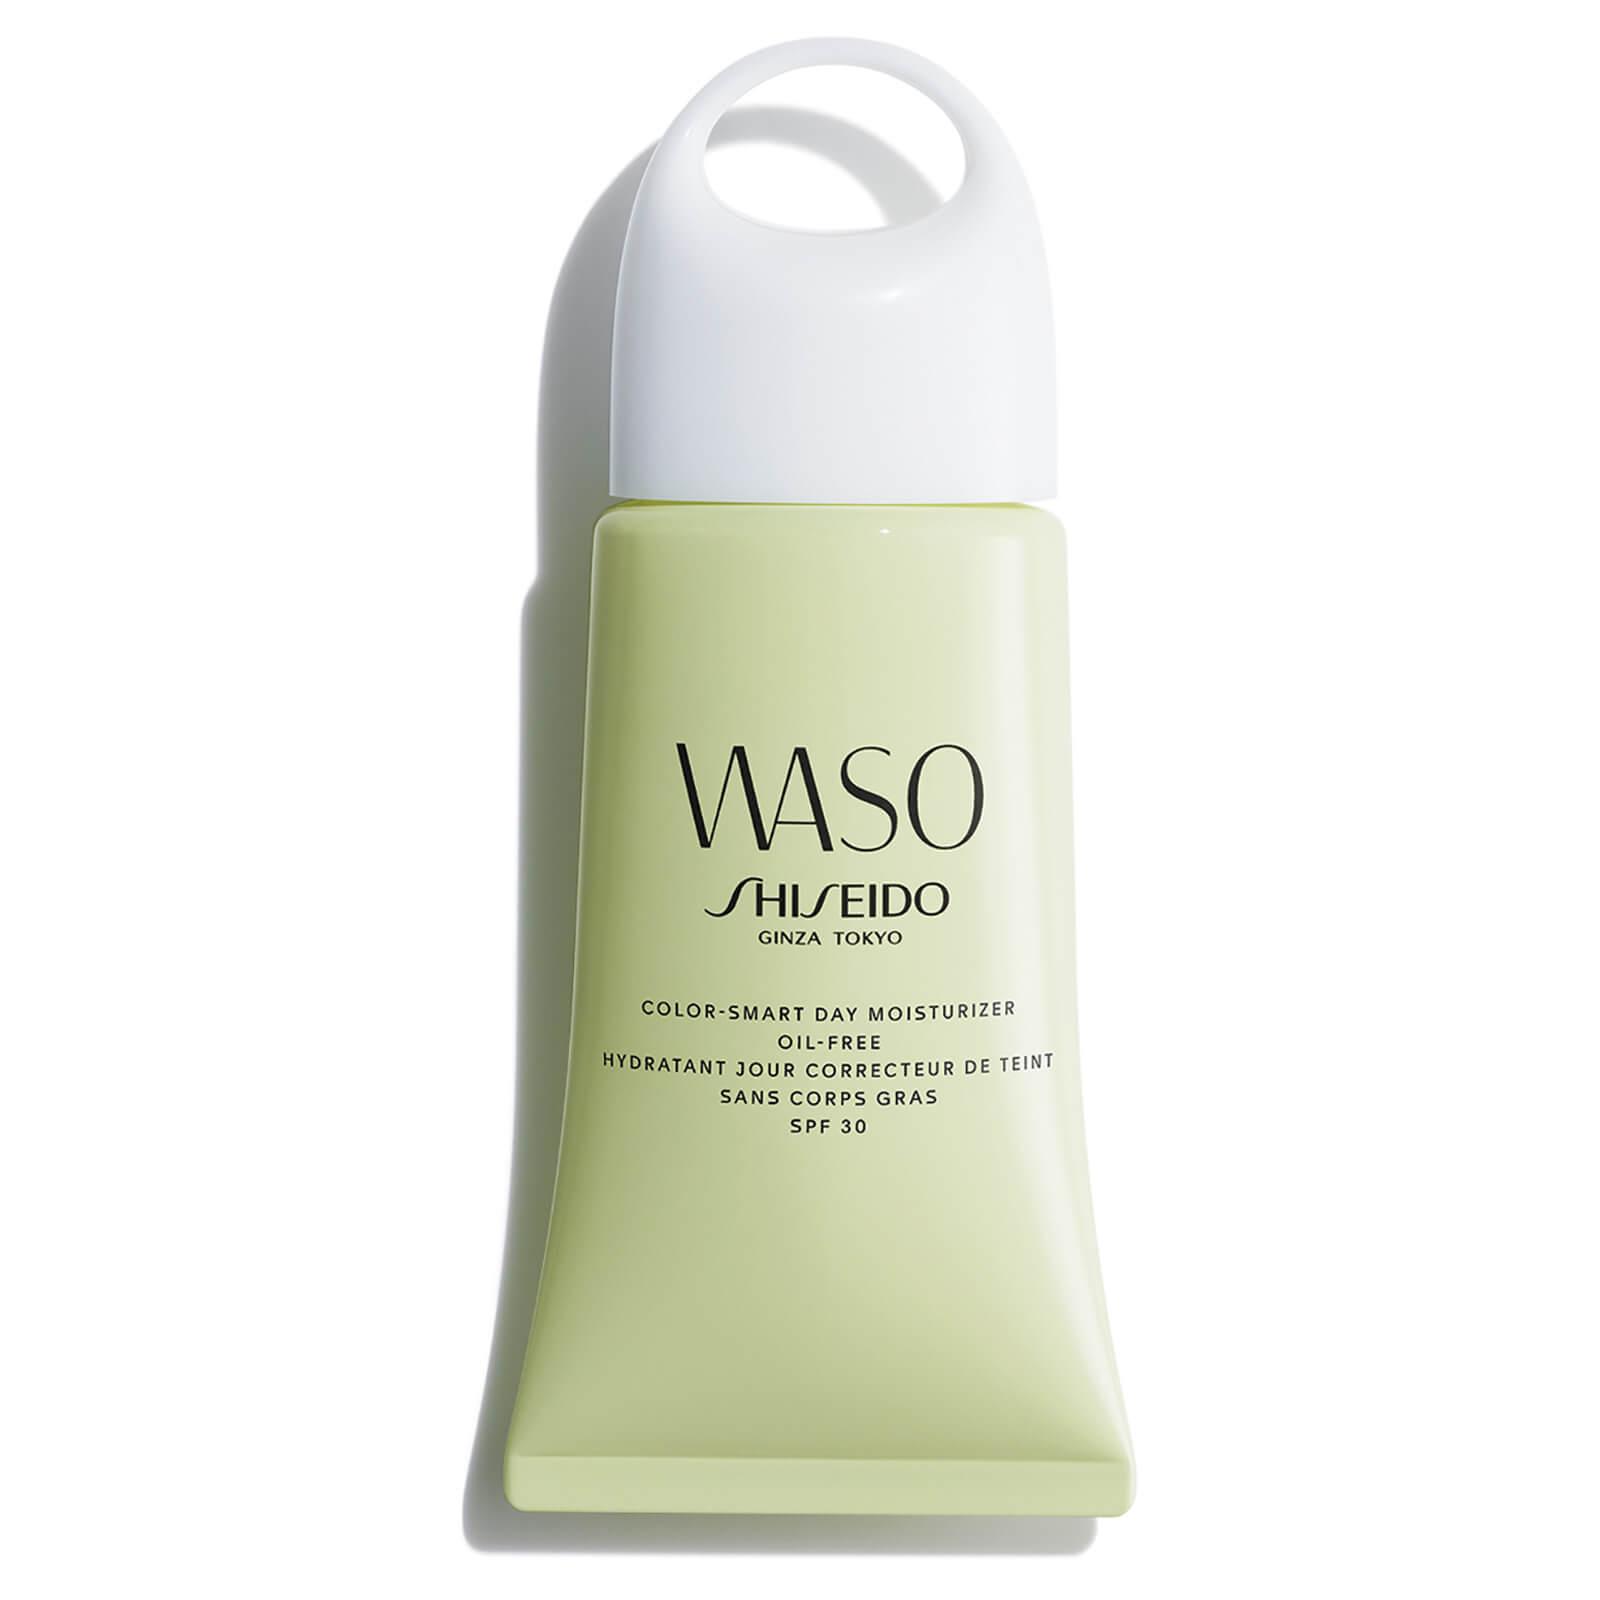 Shiseido Hydratant Jour Correcteur de Teint Sans Corps Gras SPF 30 WASO Shiseido 50 ml